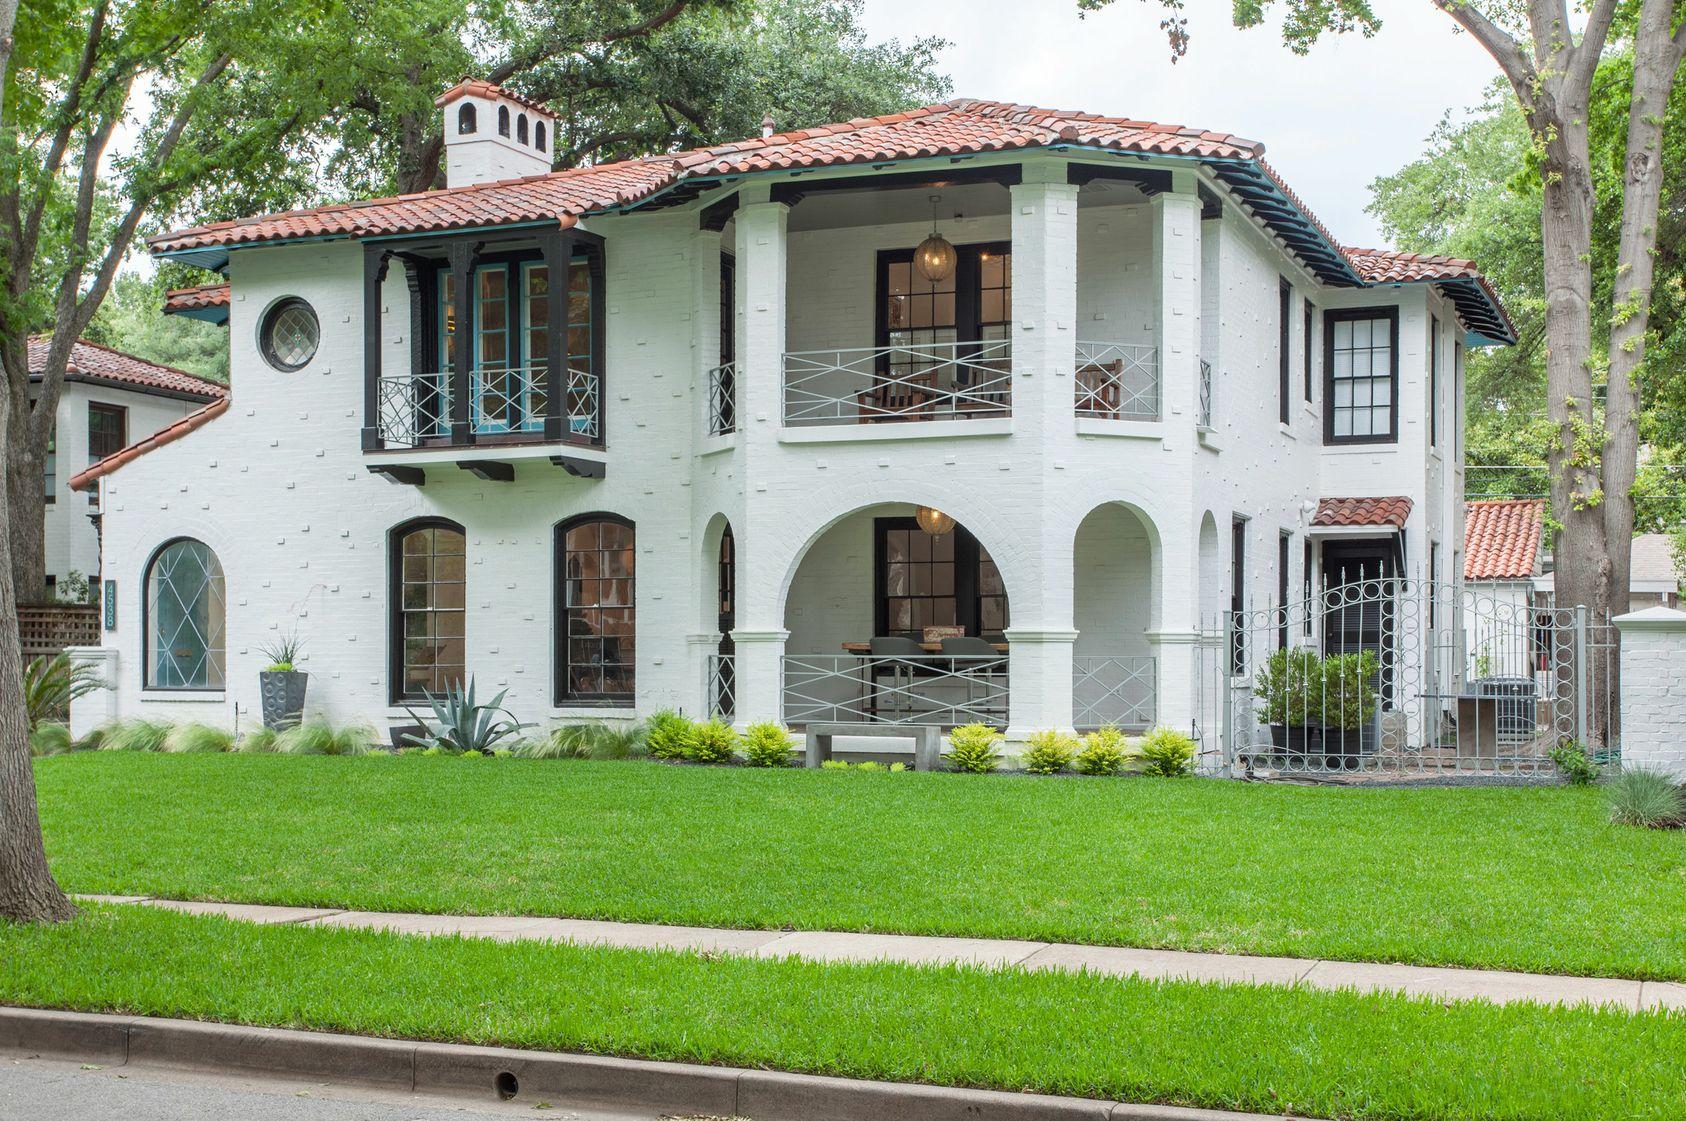 Hot Property: Reinterpreted Spanish Revival in Highland Park